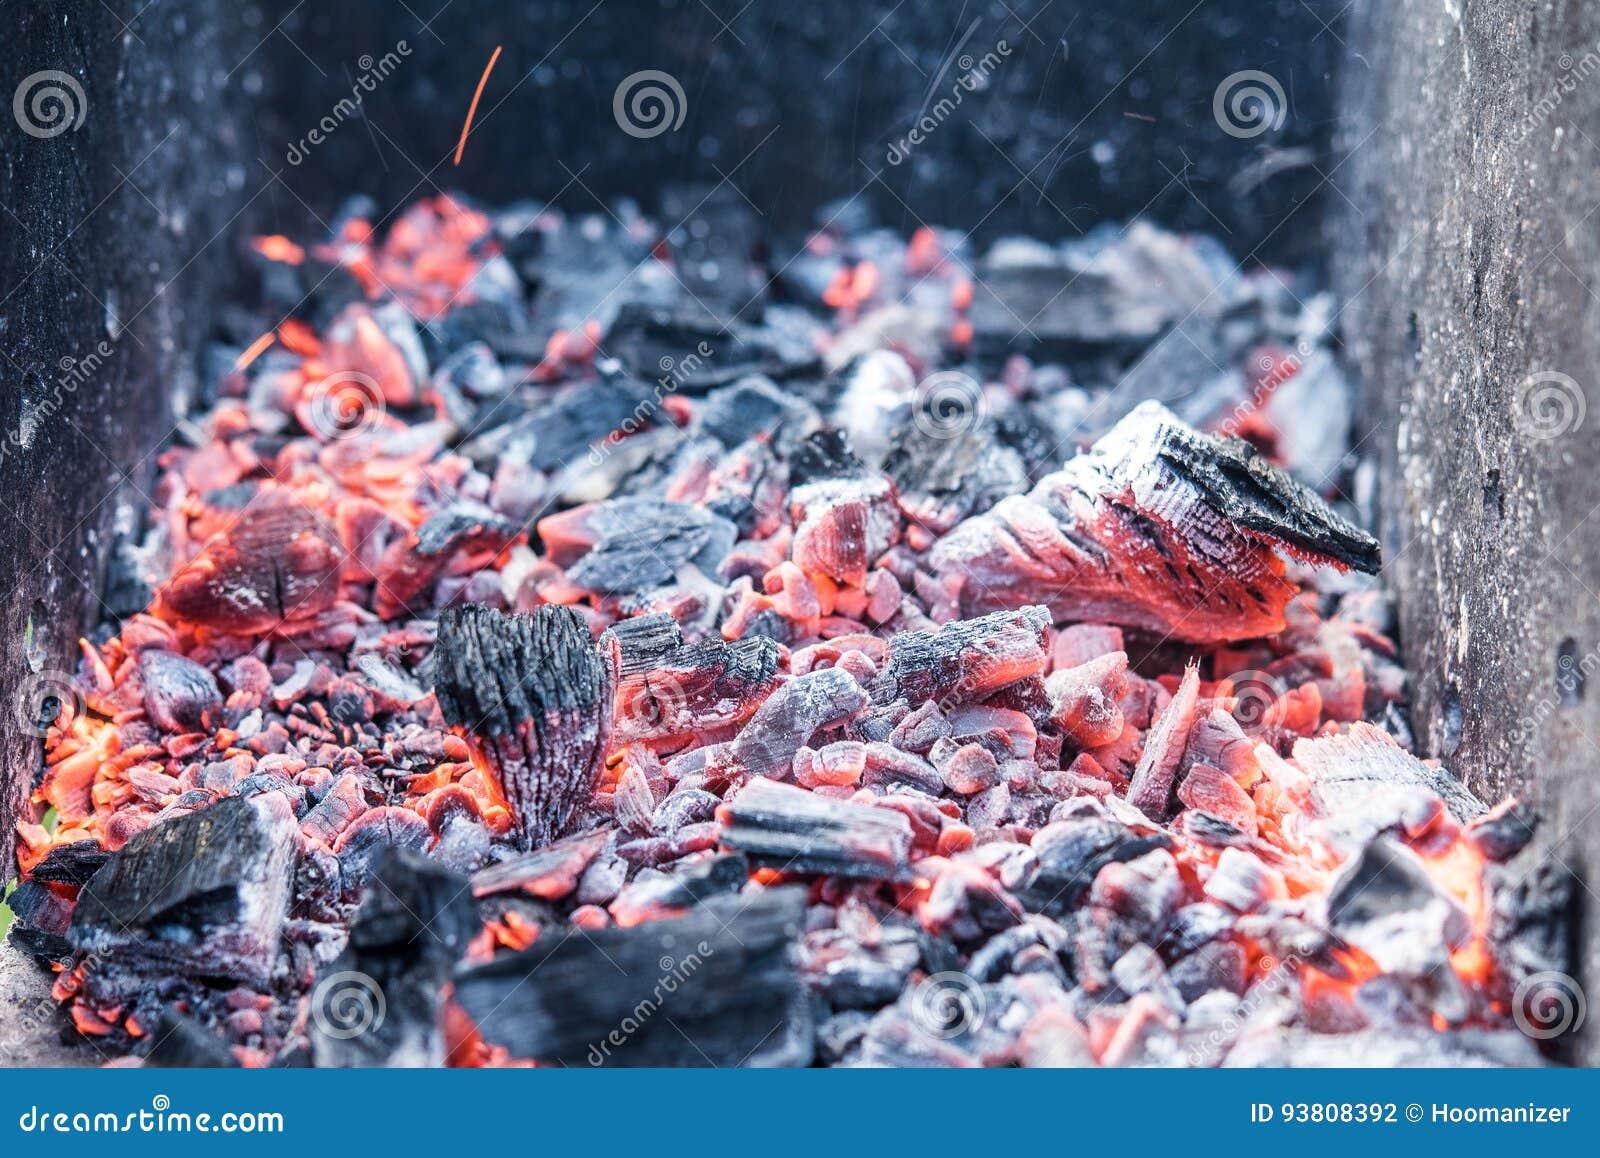 Smouldering coals at barbeque campfire